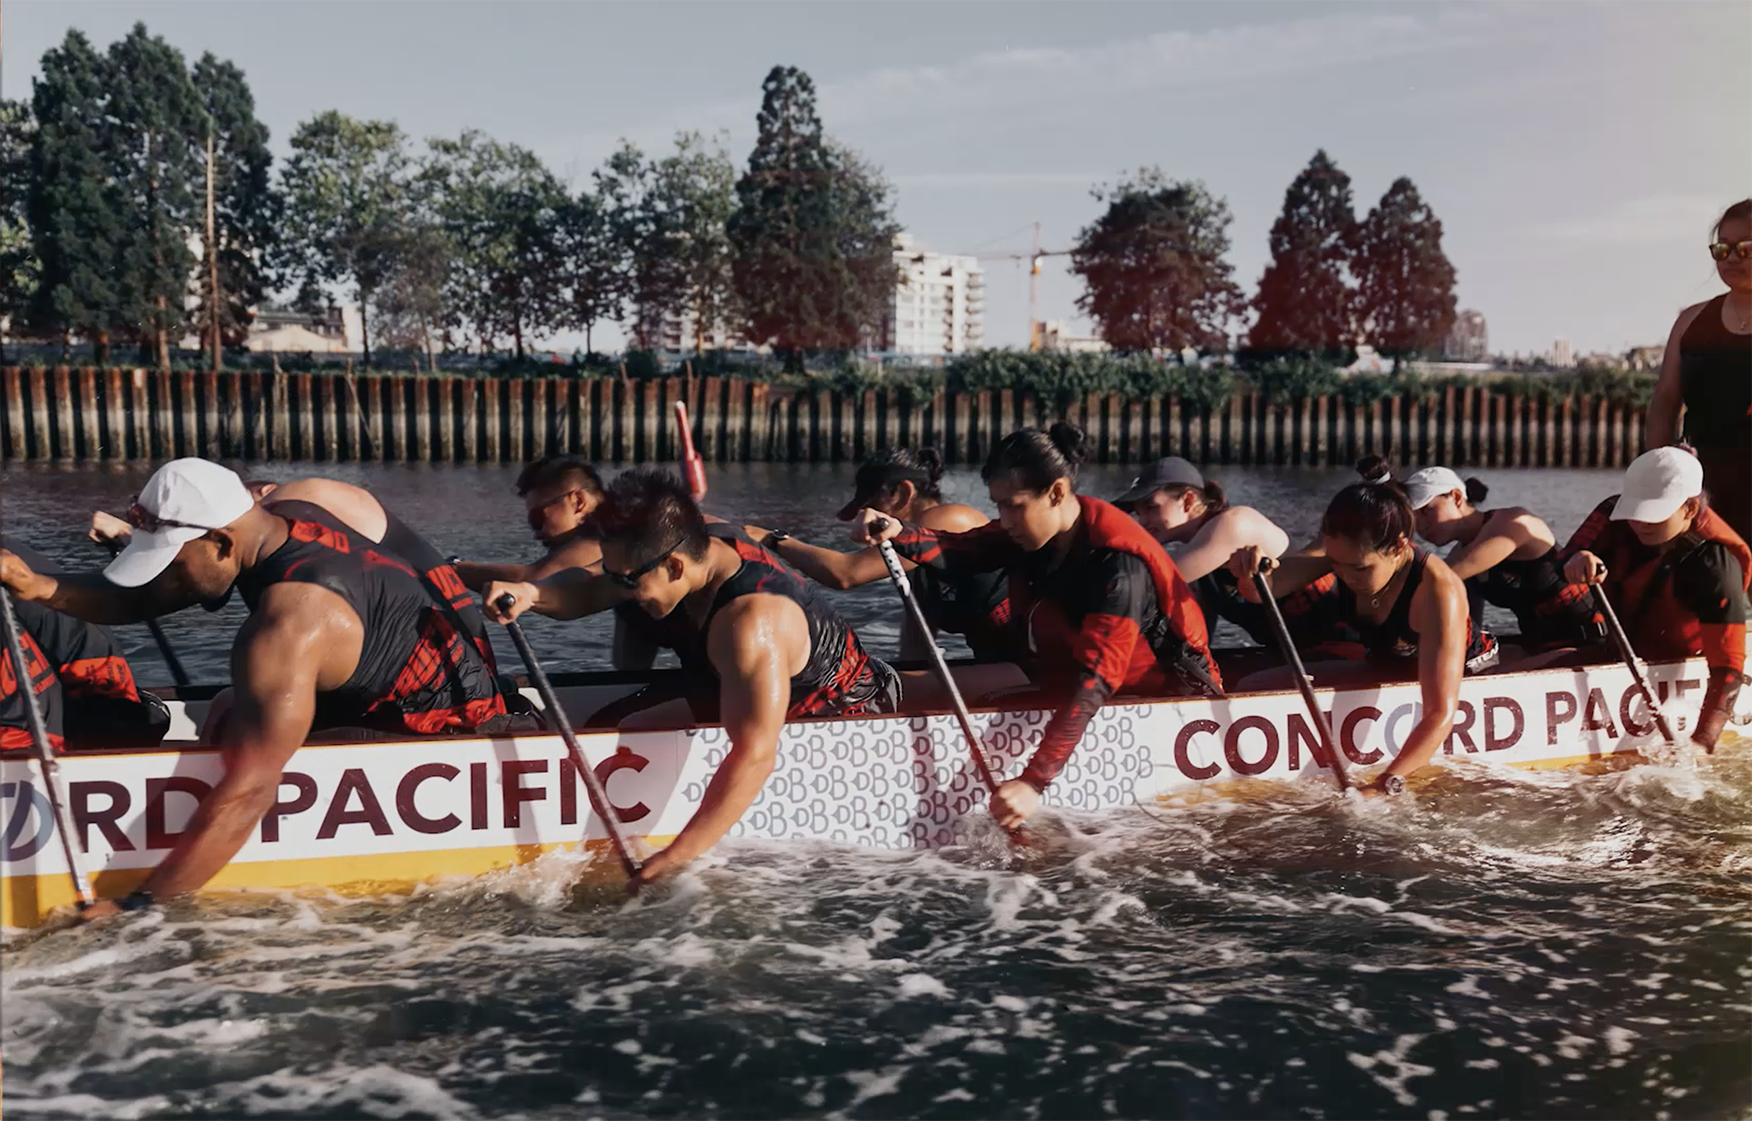 Firetruck Dragon Boat Team -